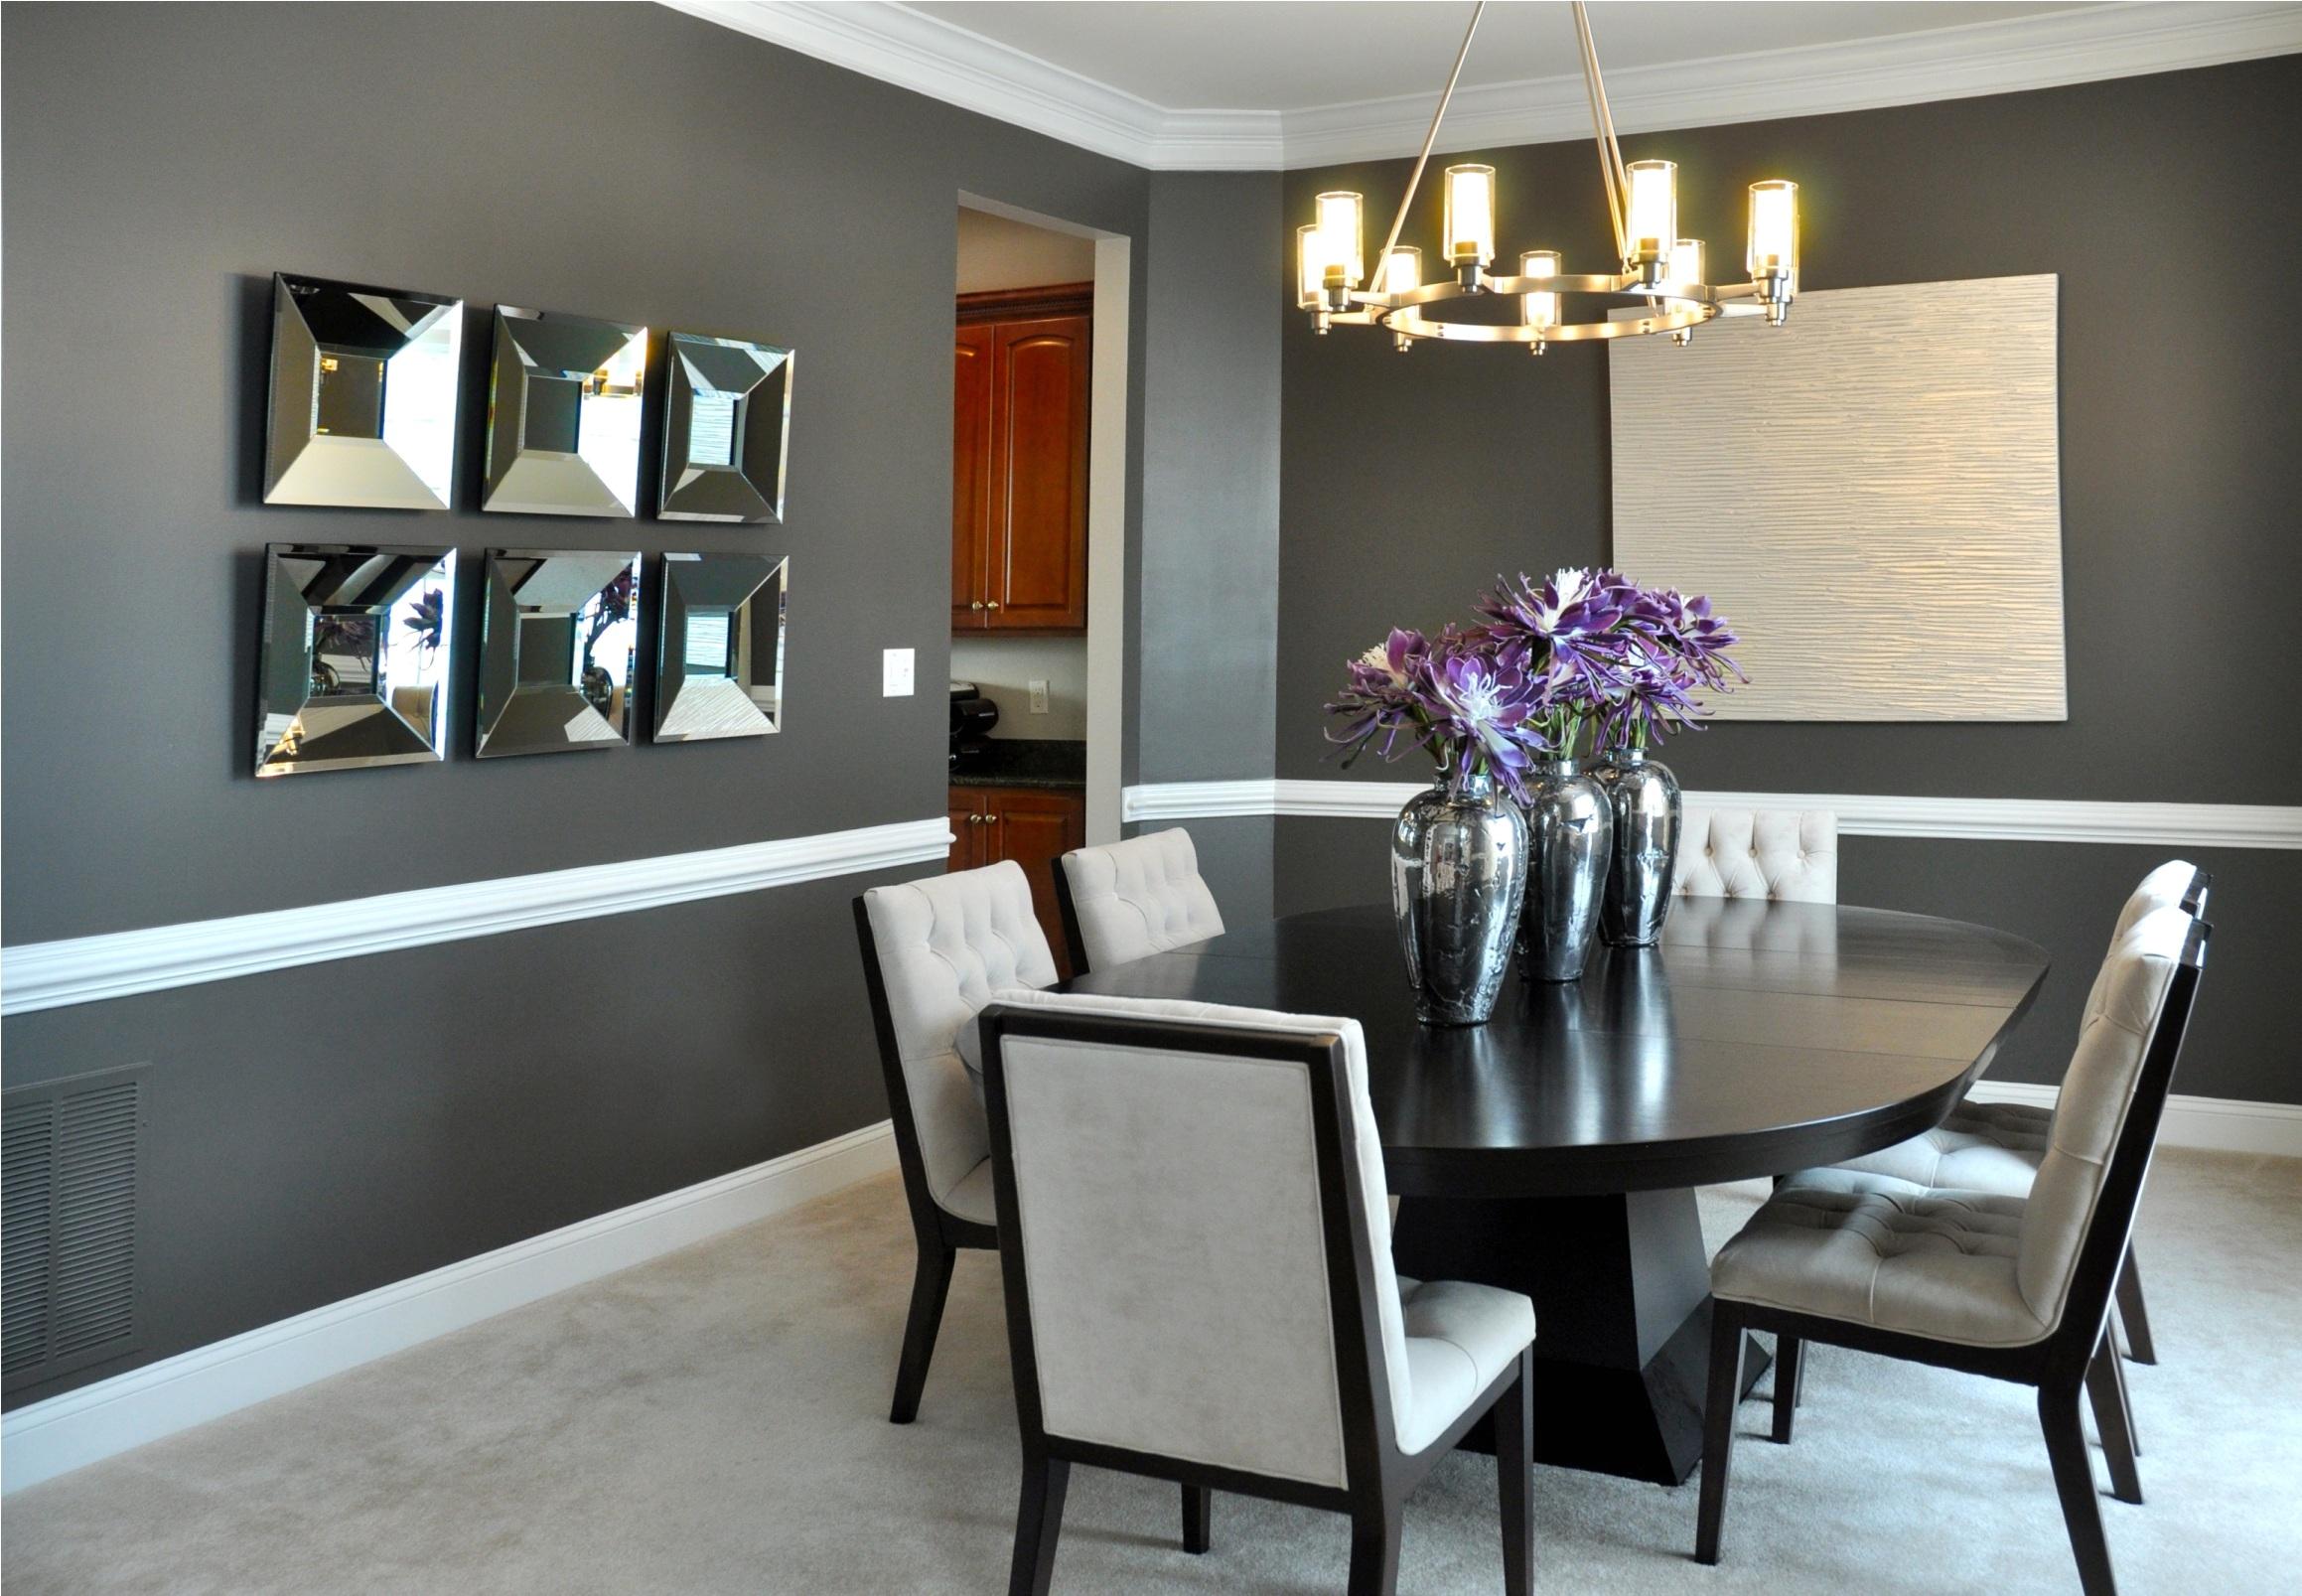 living room wall light fixtures photo - 1